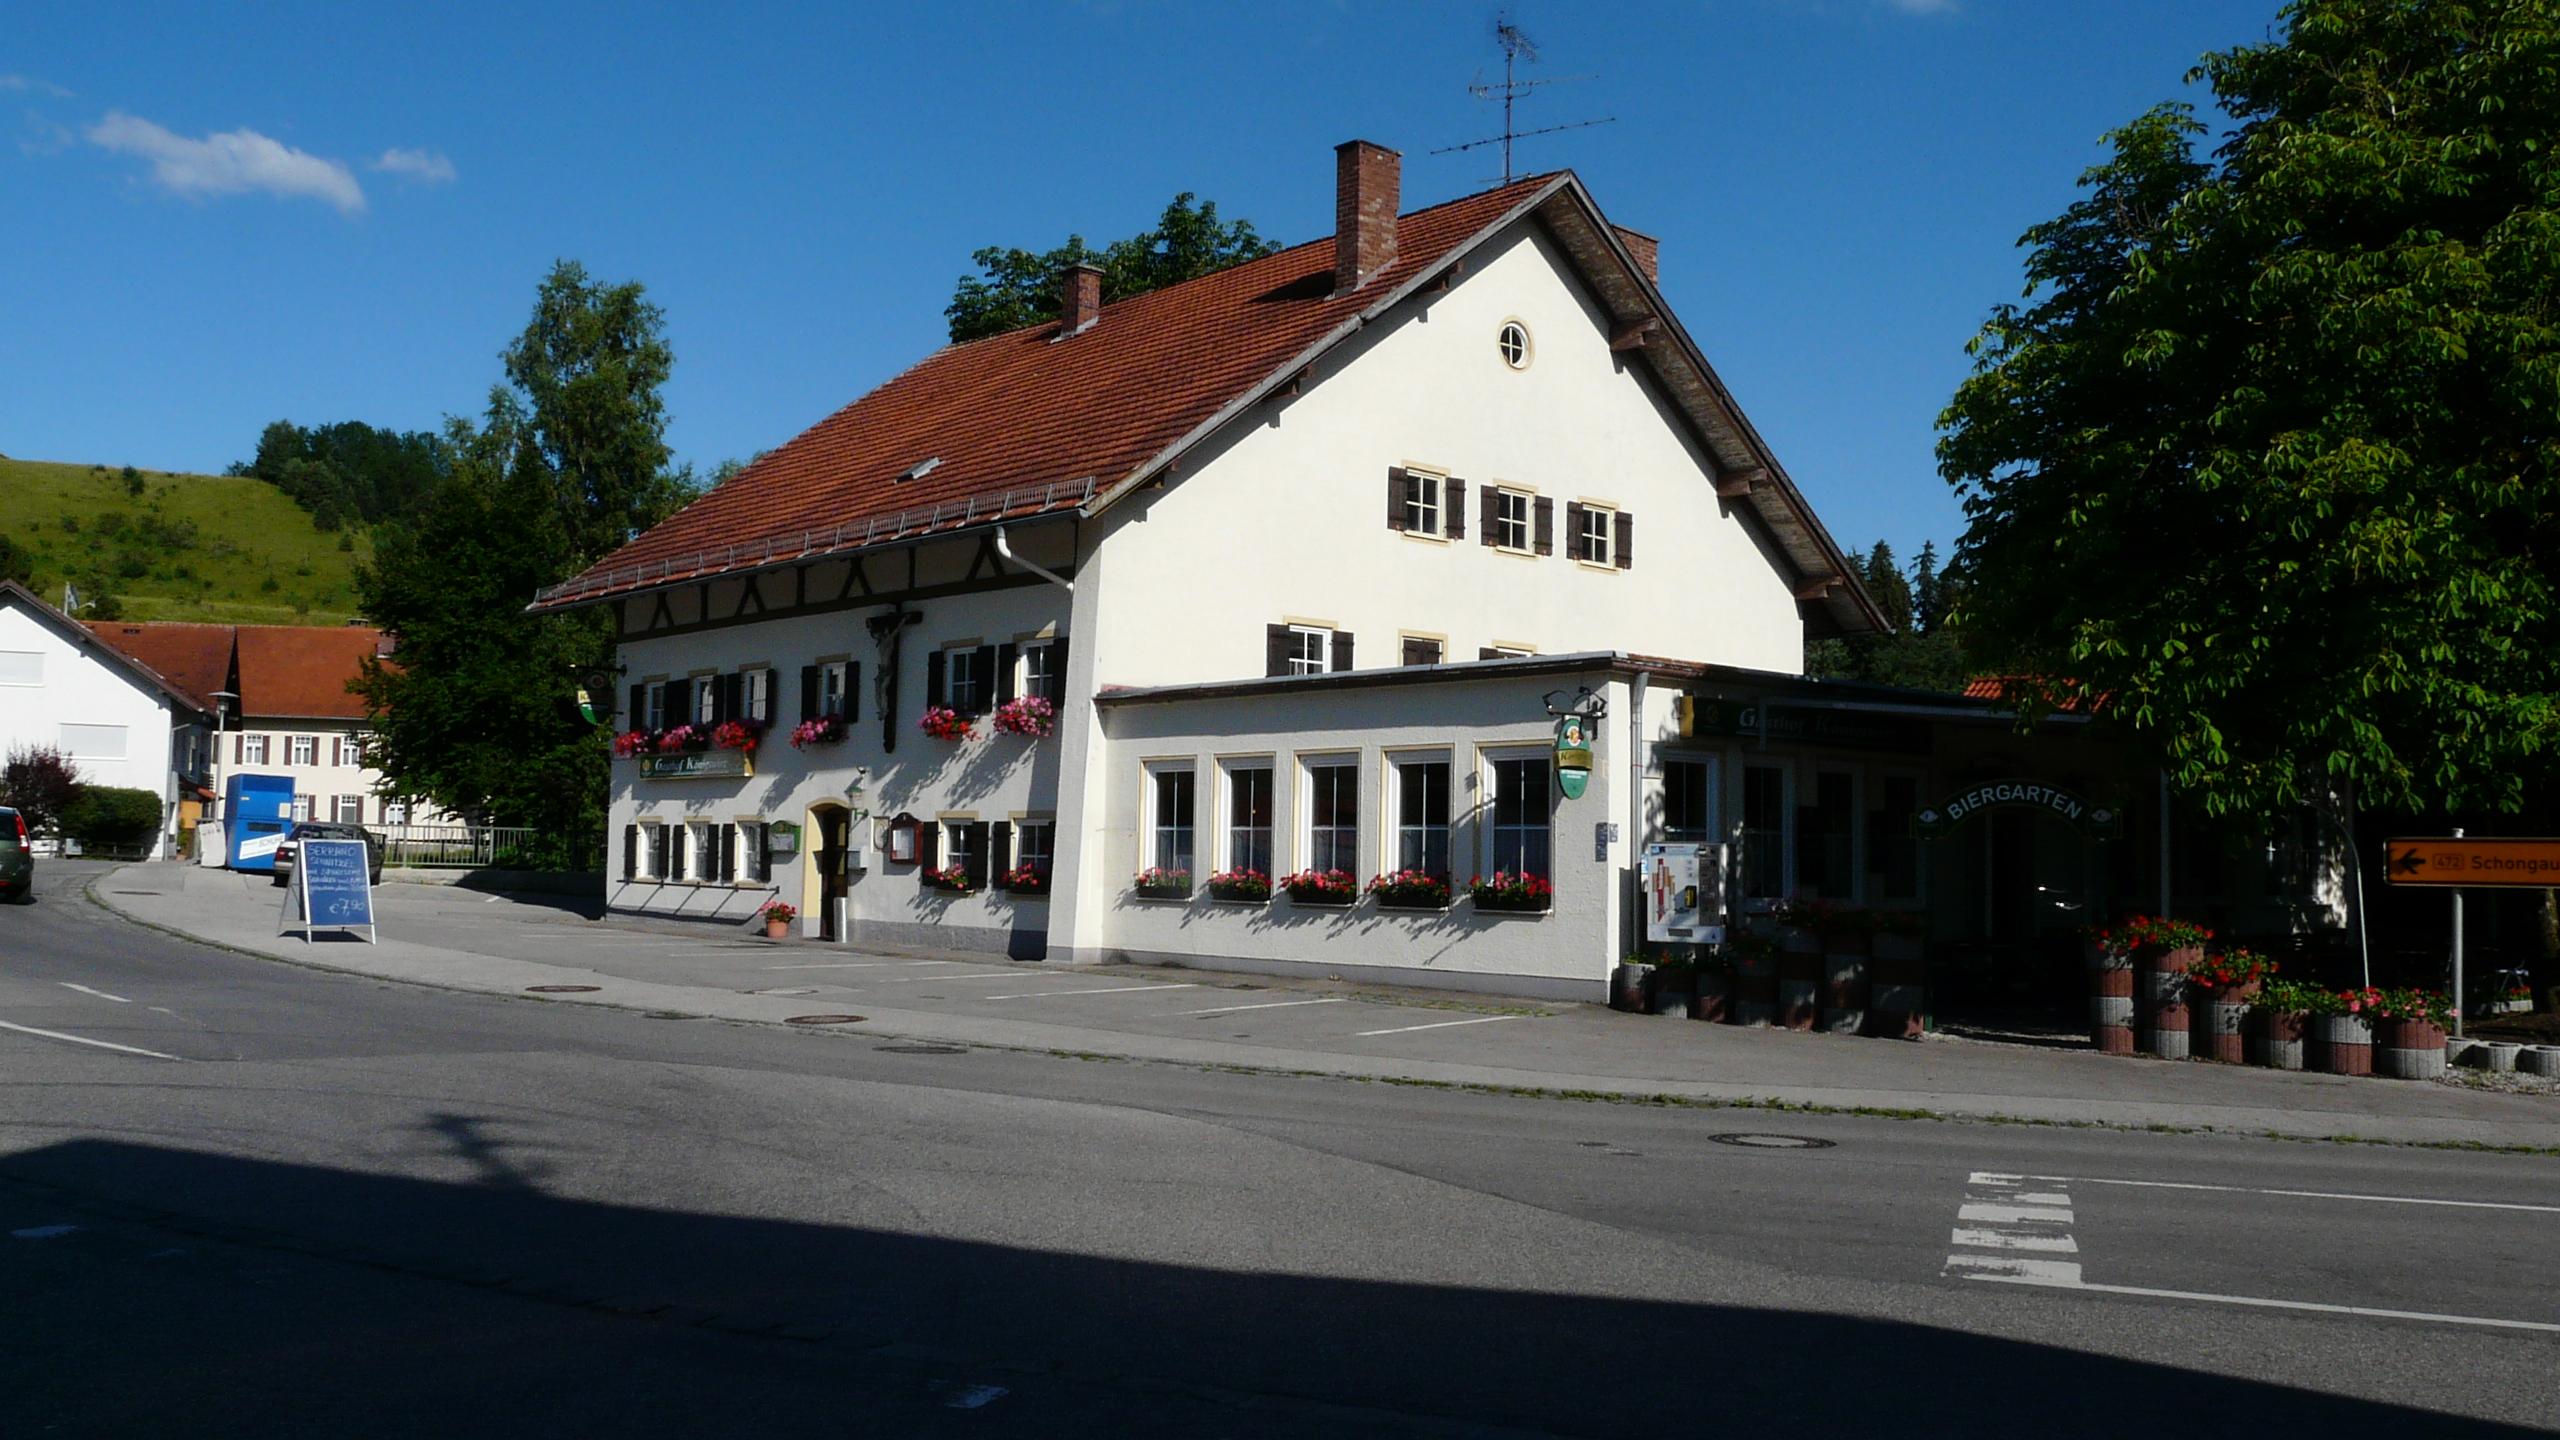 Bertoldshofen